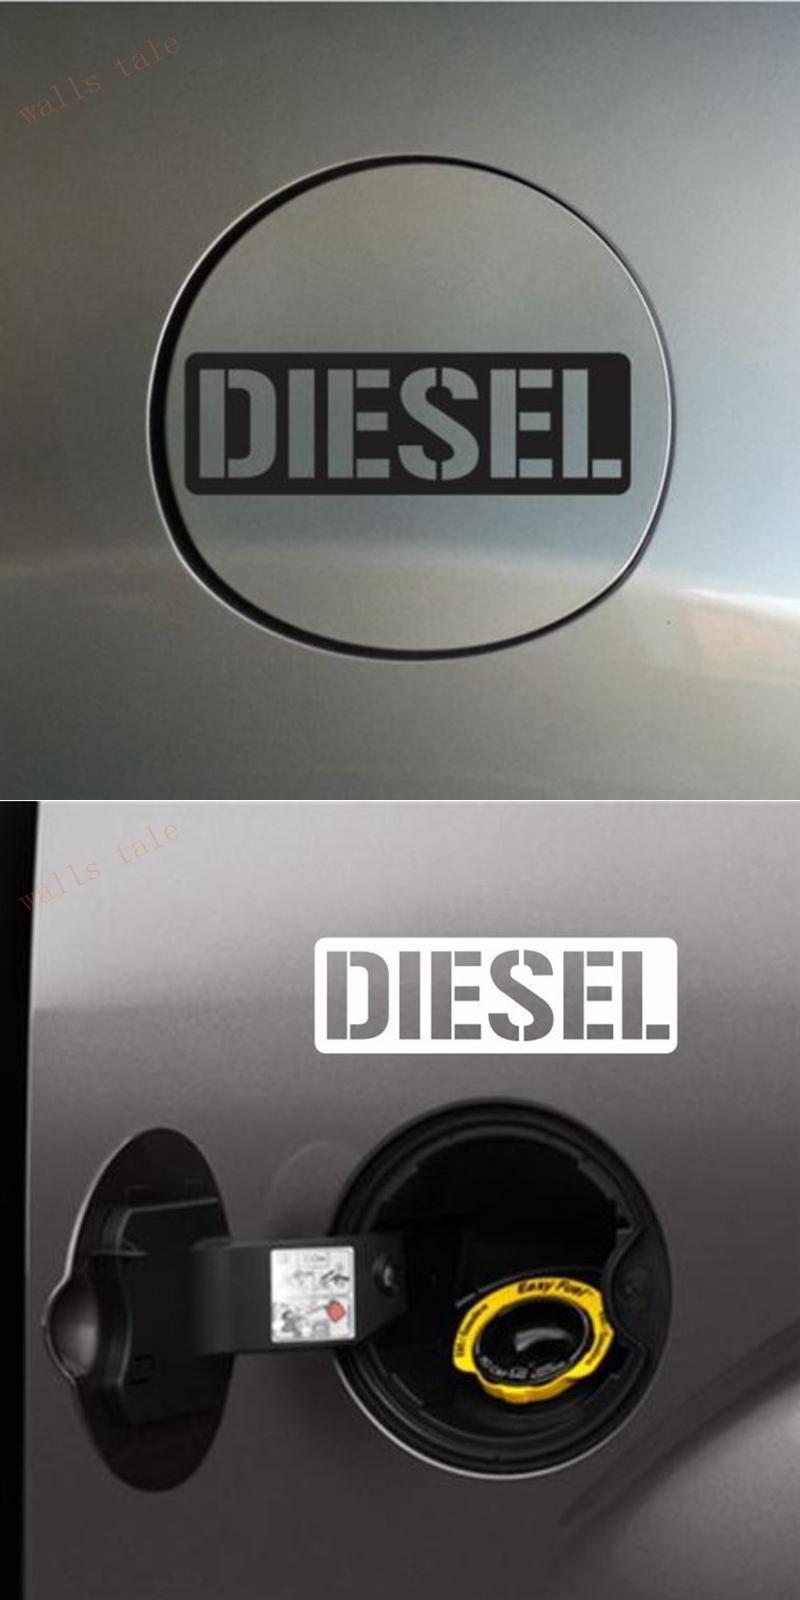 Visit to Buy] DIESEL Army Style Sticker Vinyl Decal Truck